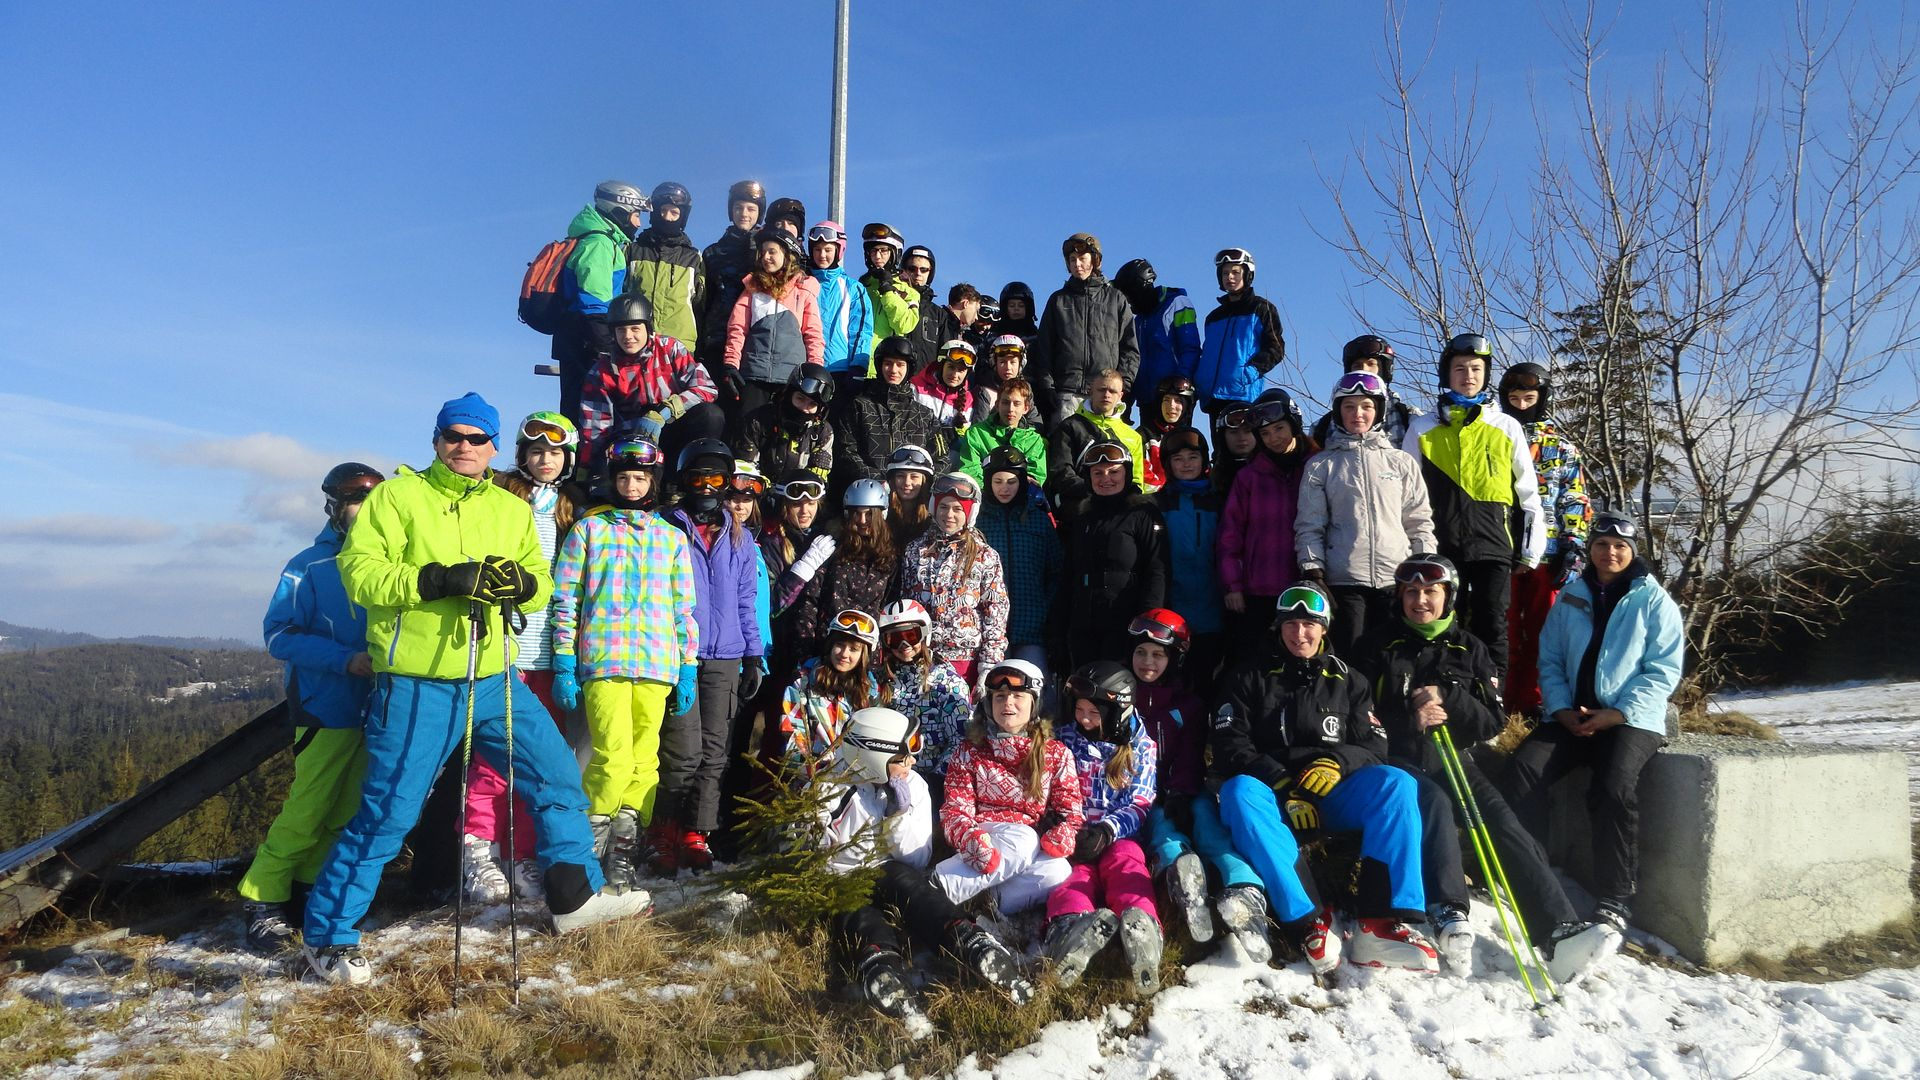 CarTourist_narty-snowboard_2014-foto-16